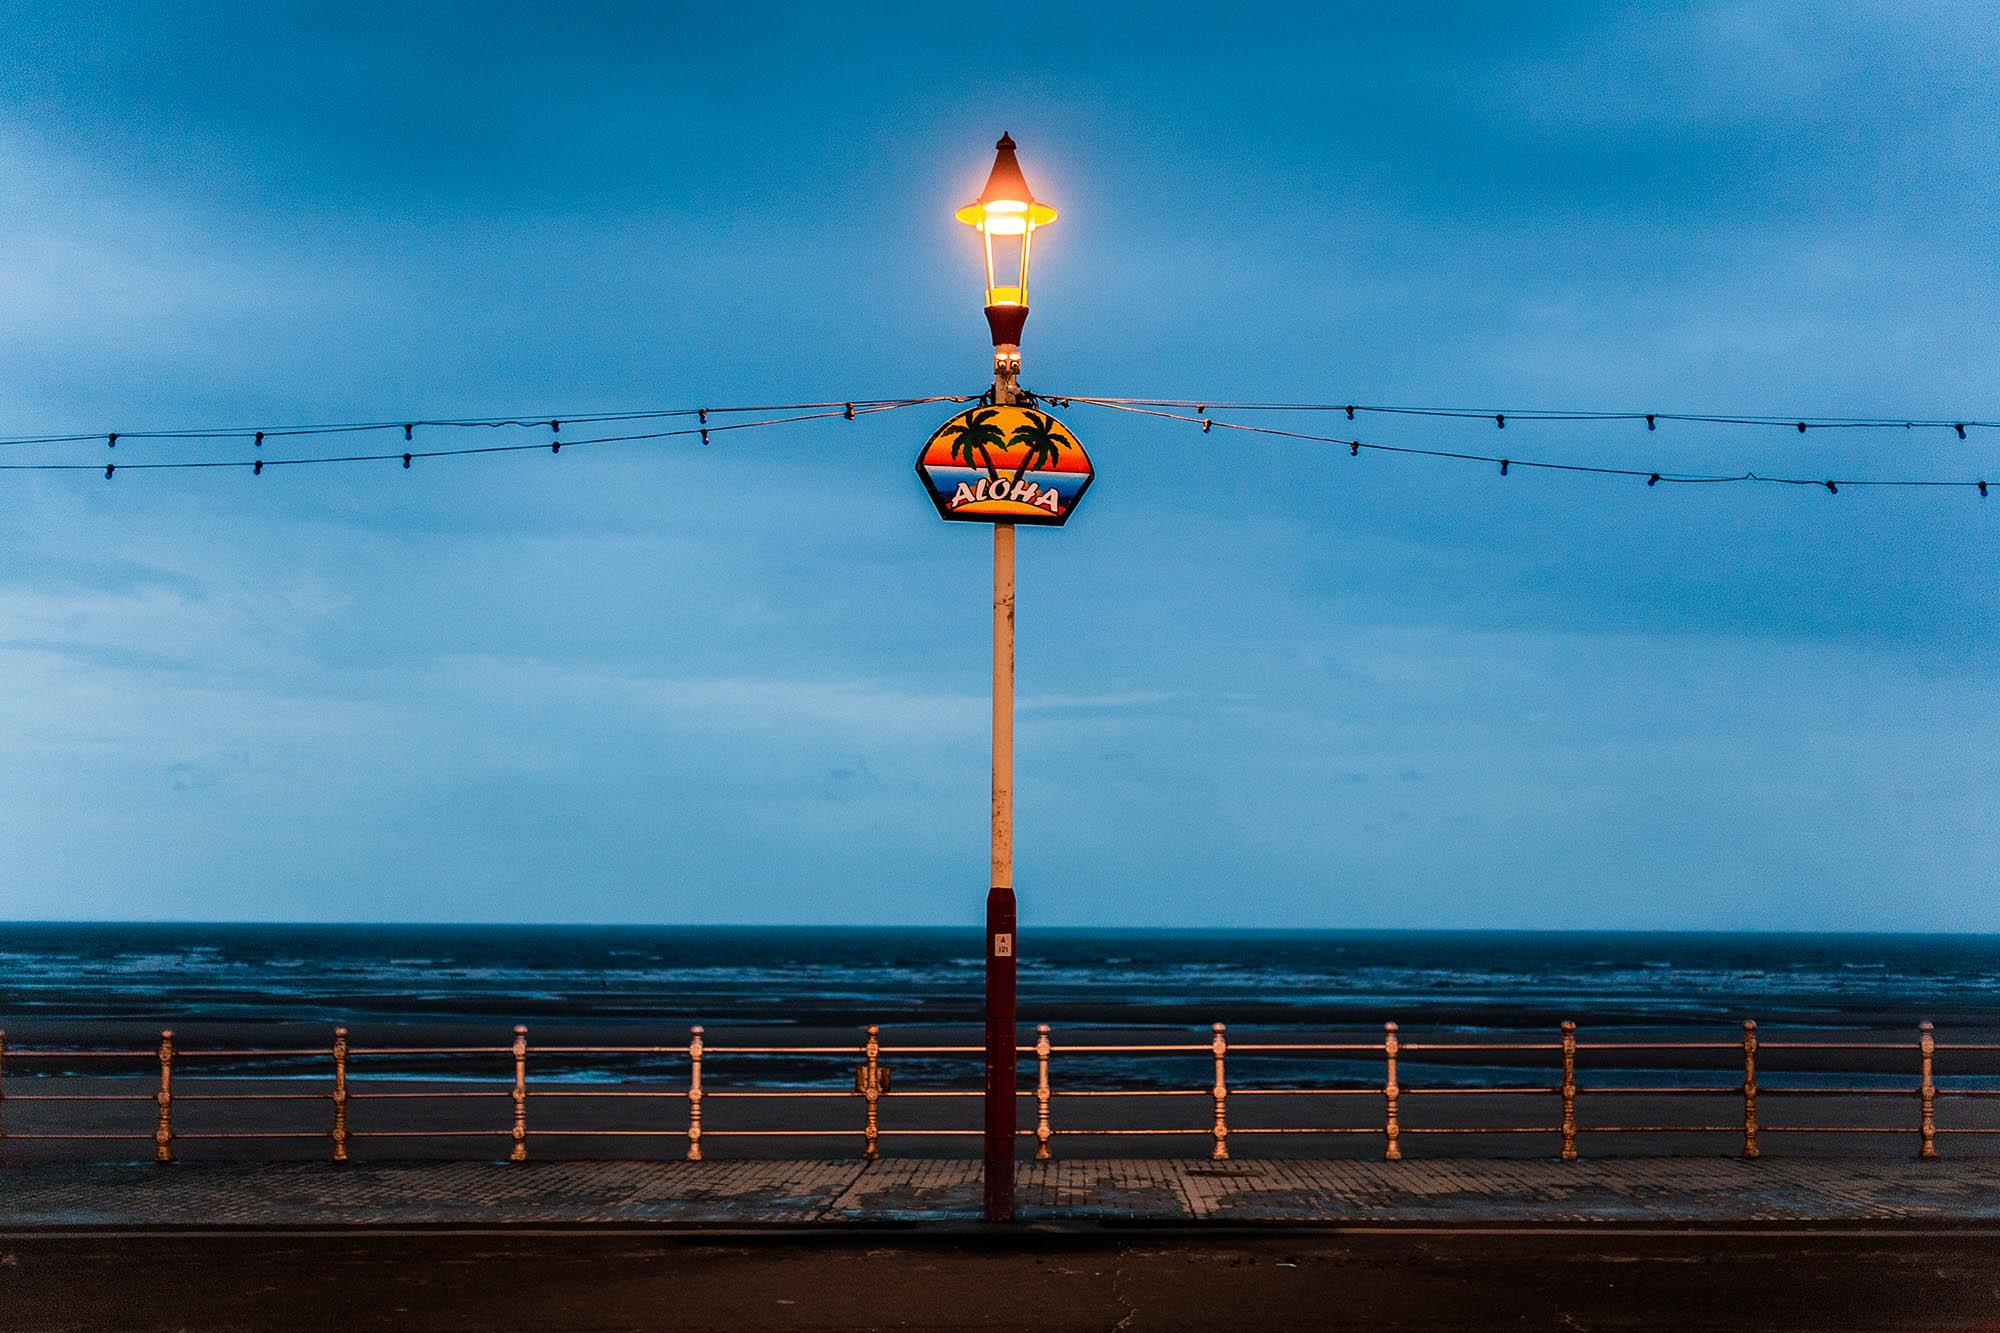 Promenade, Blackpool.